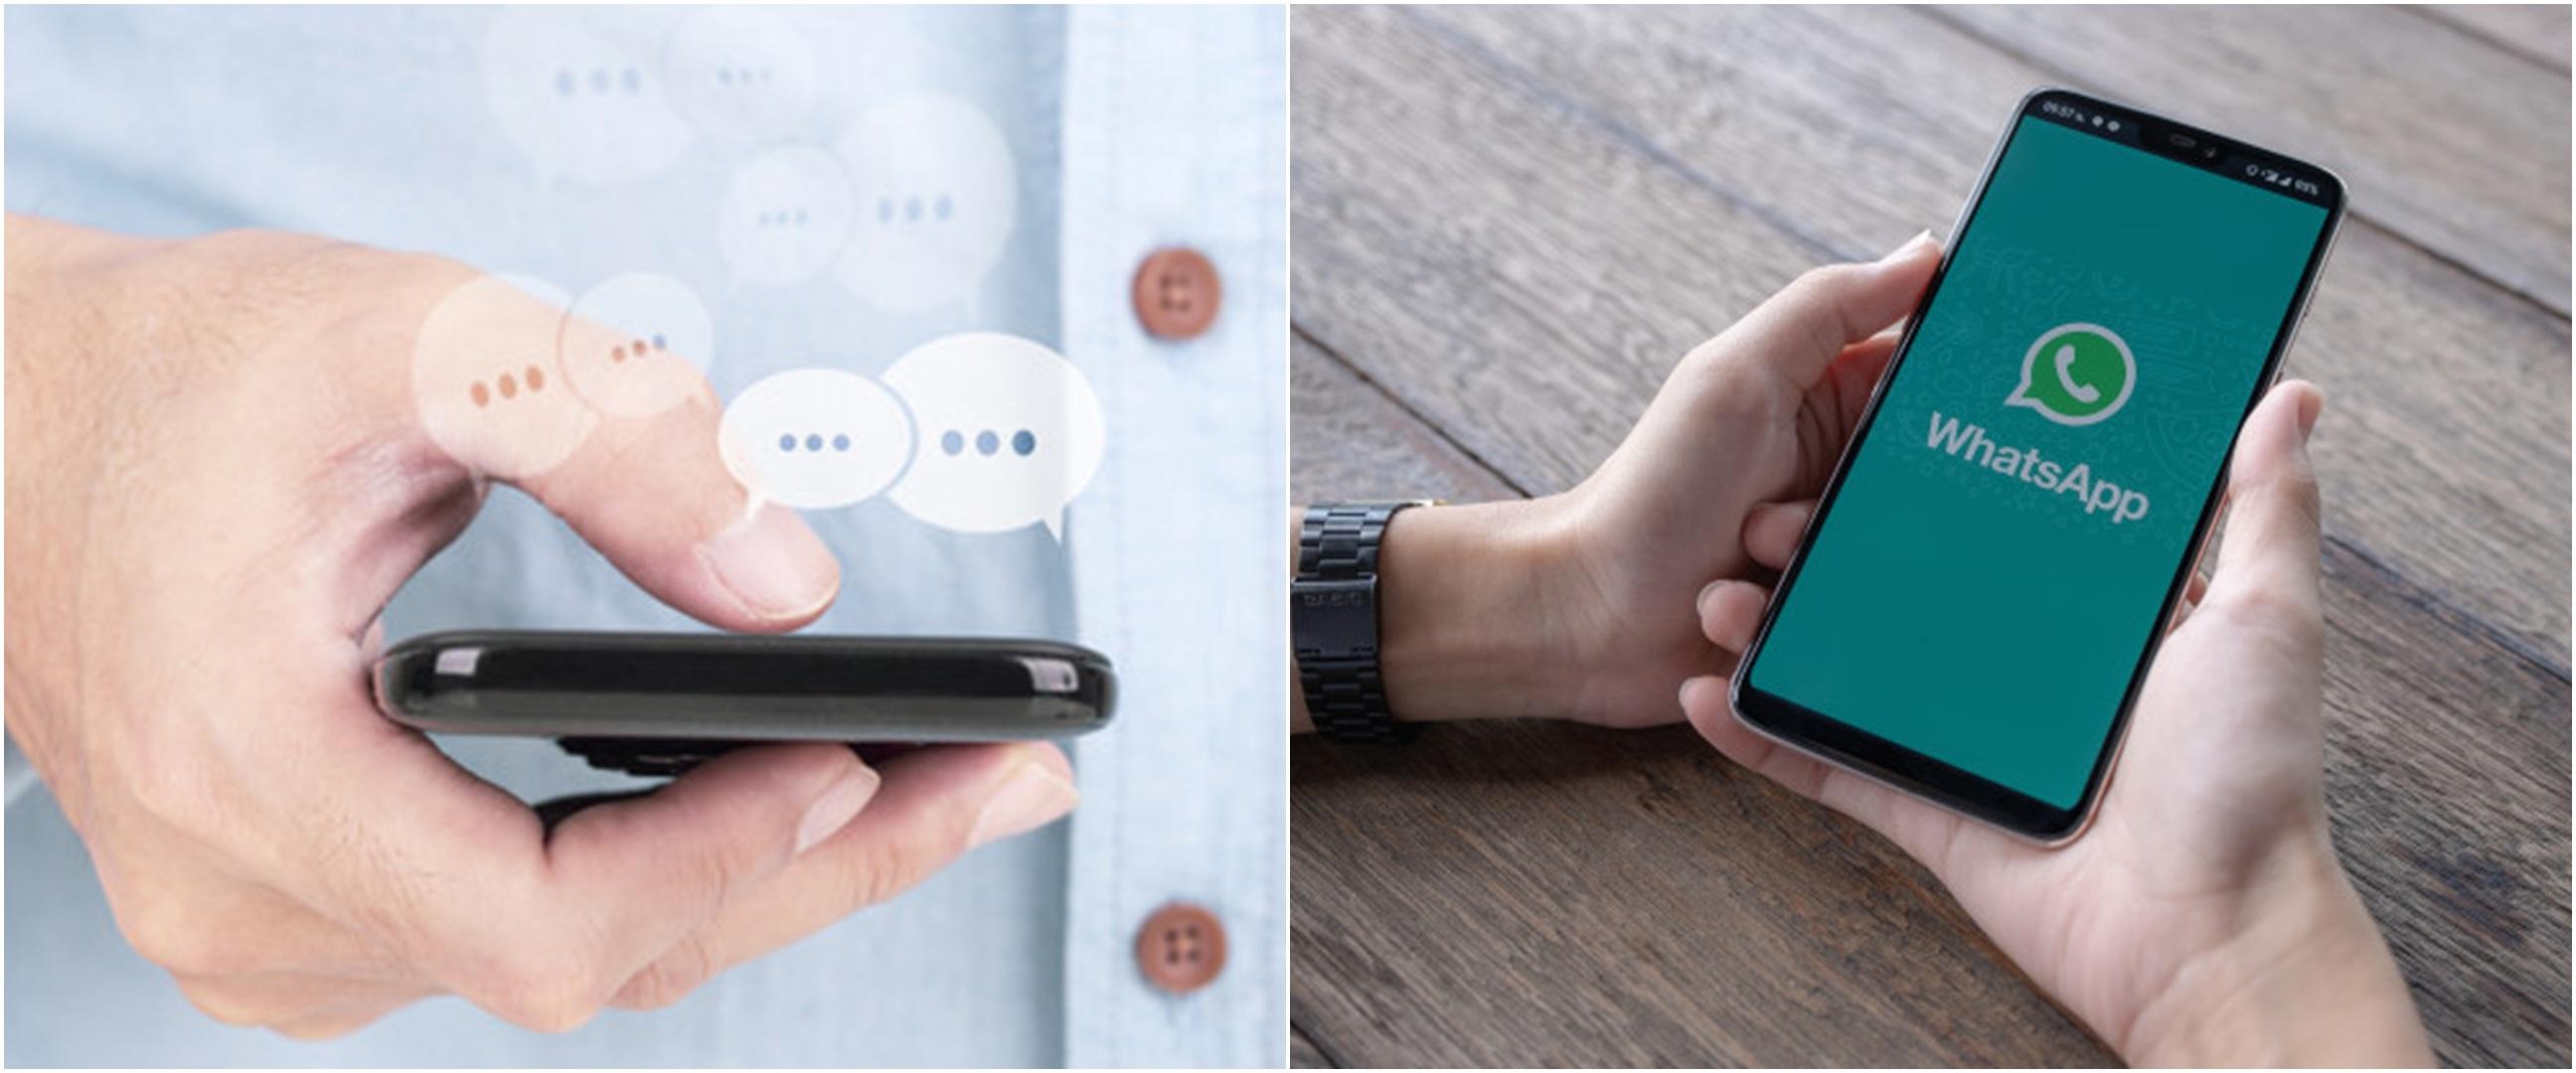 2 Cara menonaktifkan WhatsApp sementara di Android & iPhone